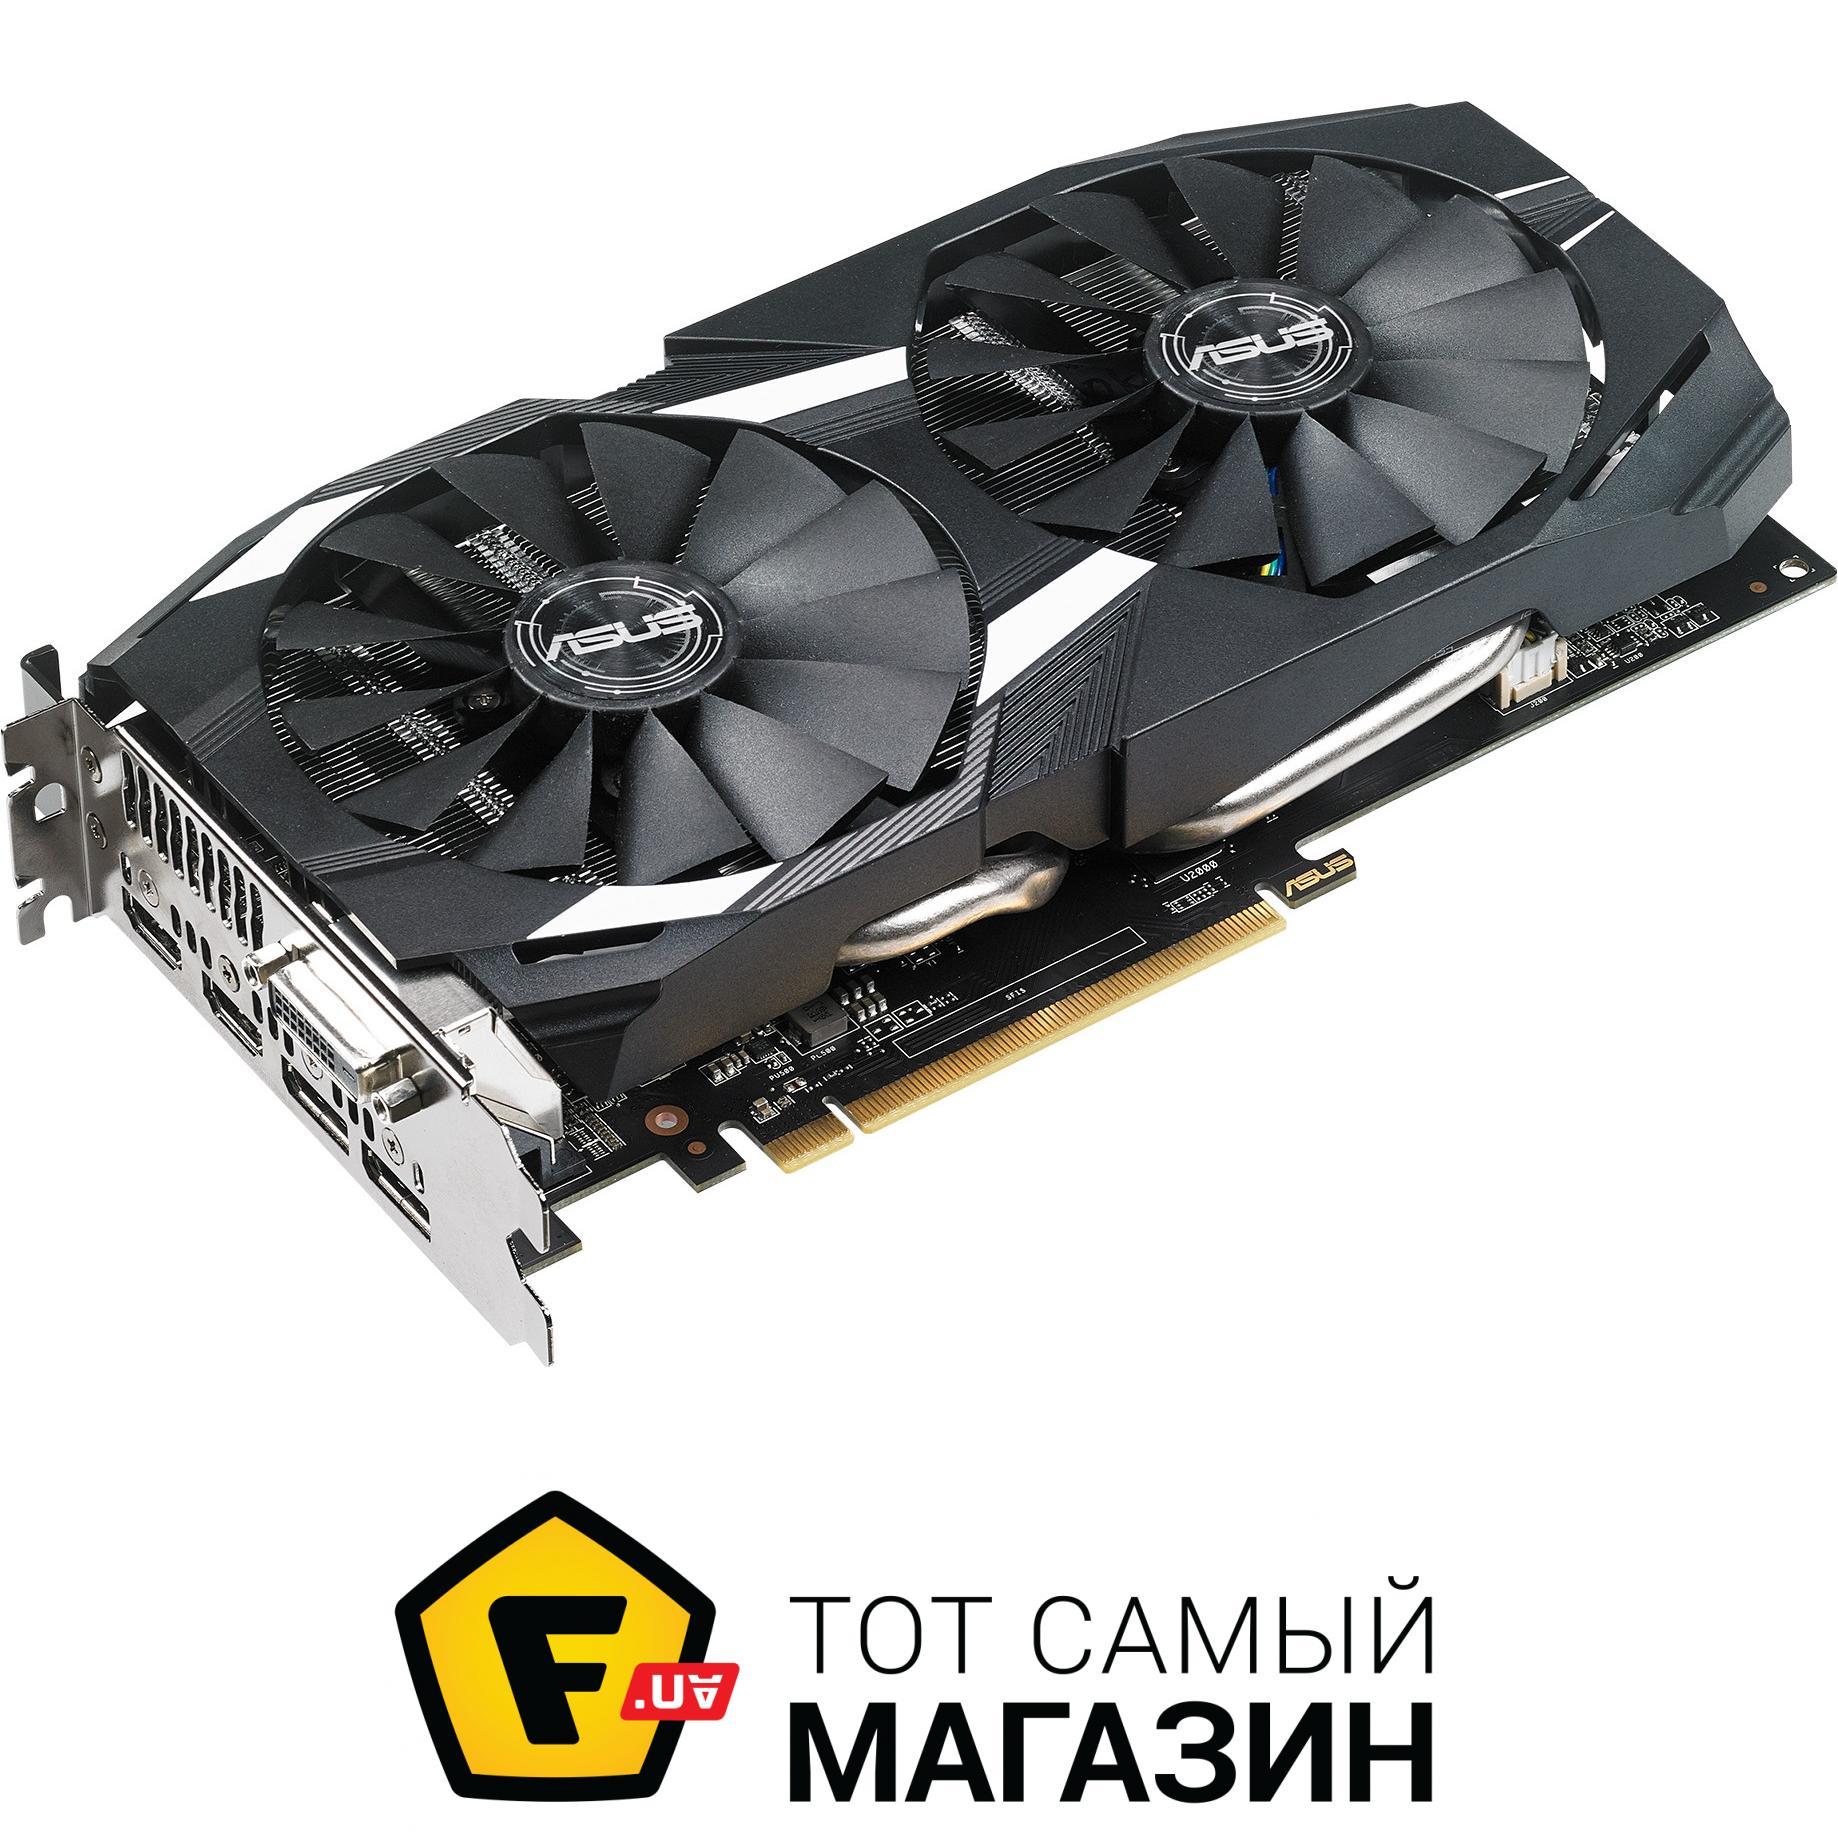 ASUS Radeon RX 580 4GB, 256bit, DDR5 (DUAL-RX580-O4G)